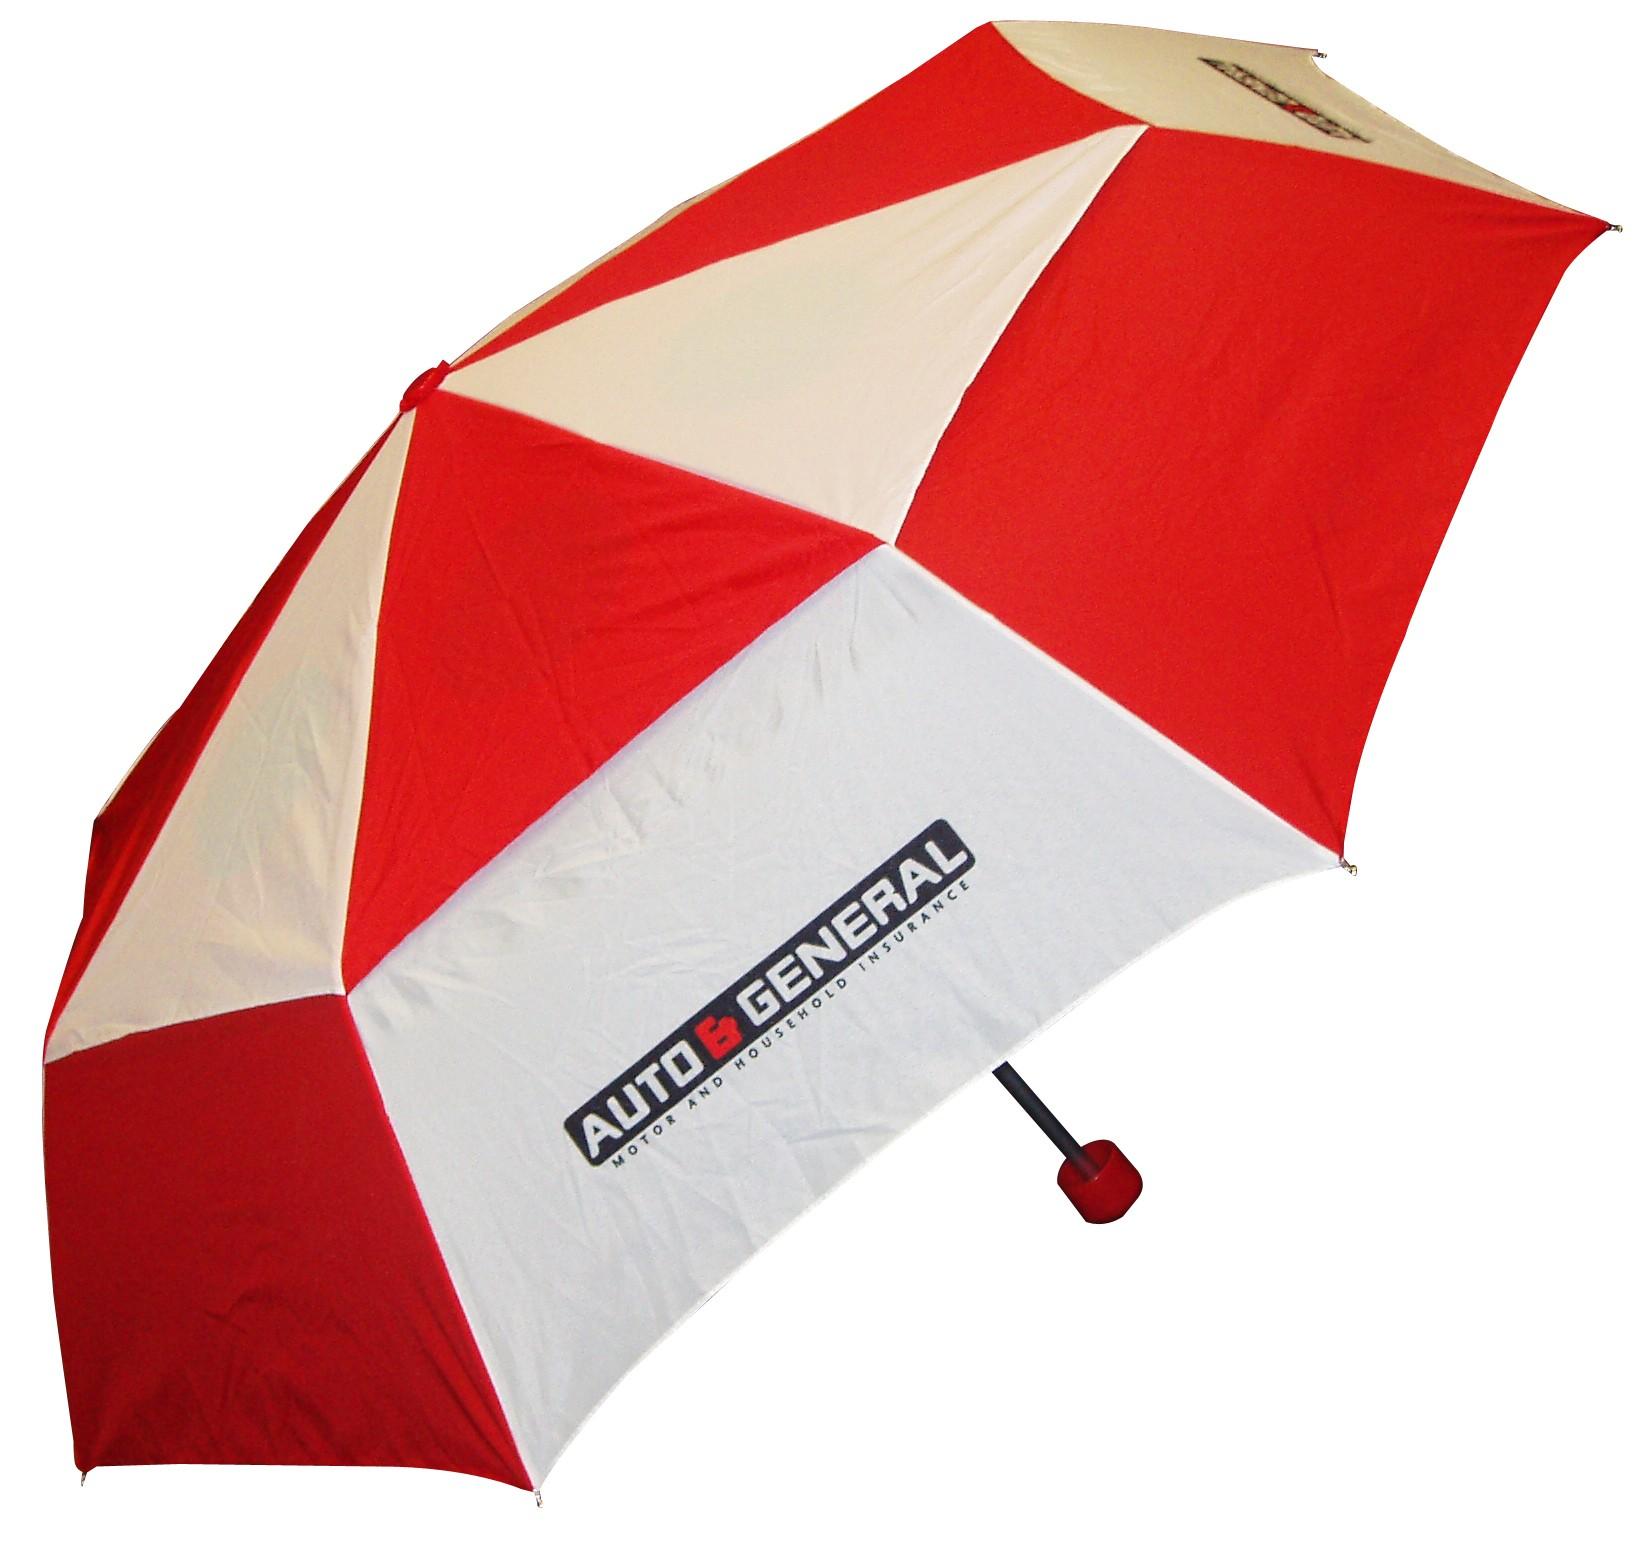 Printed Promotional Minivent Umbrella